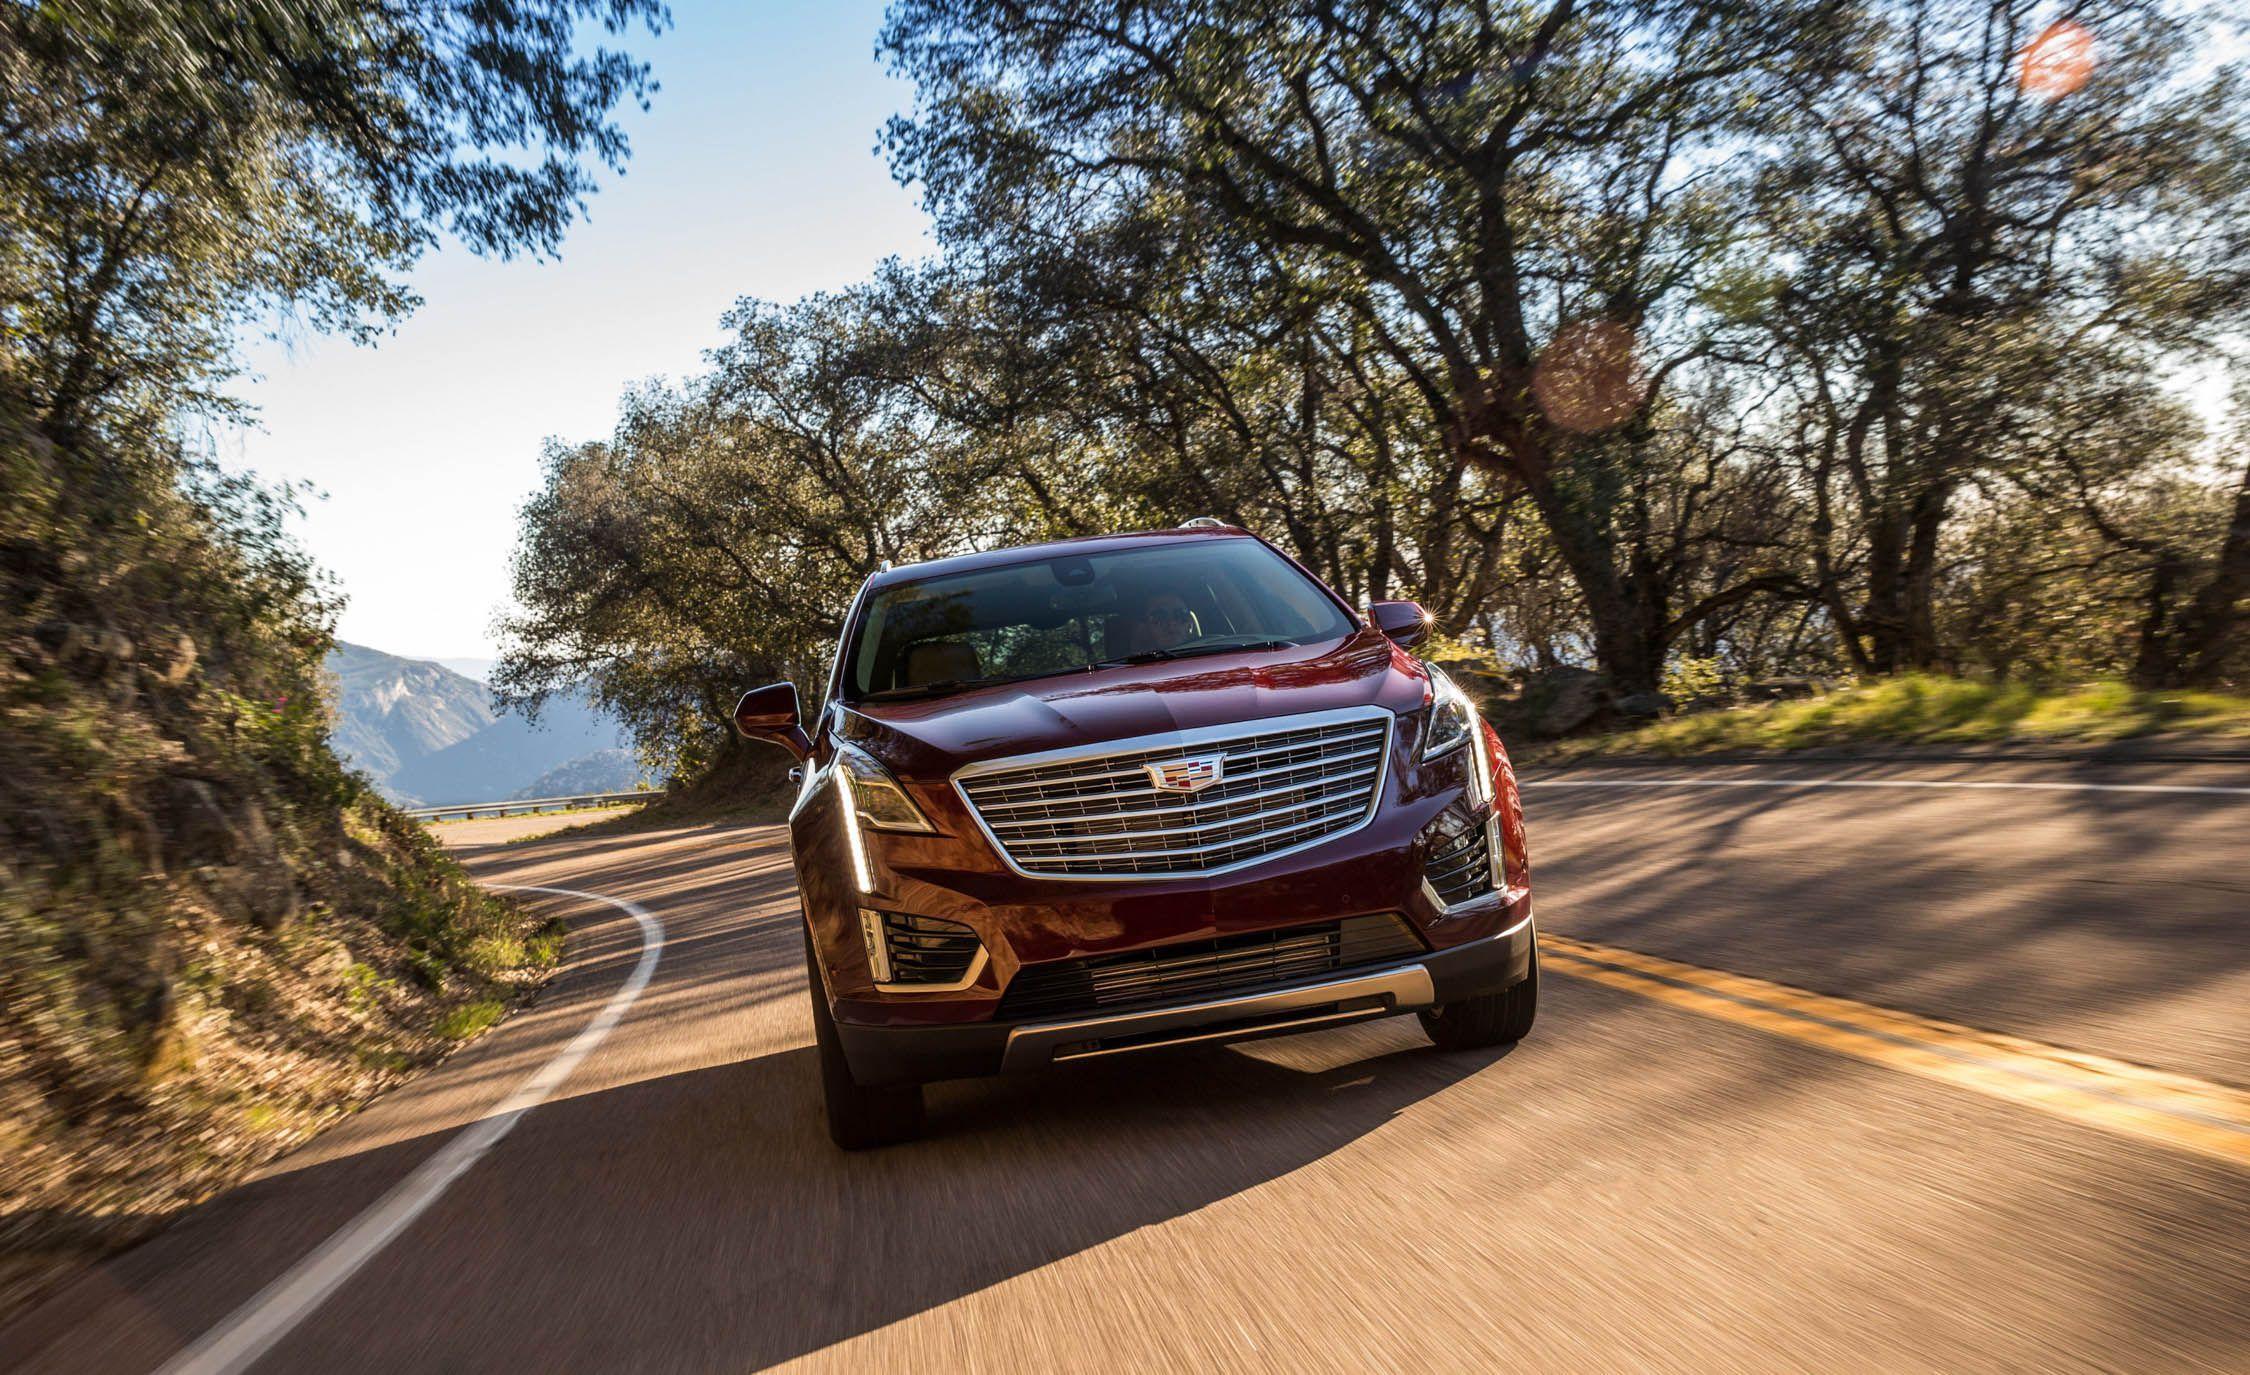 2018 Cadillac XT5 Photo Gallery